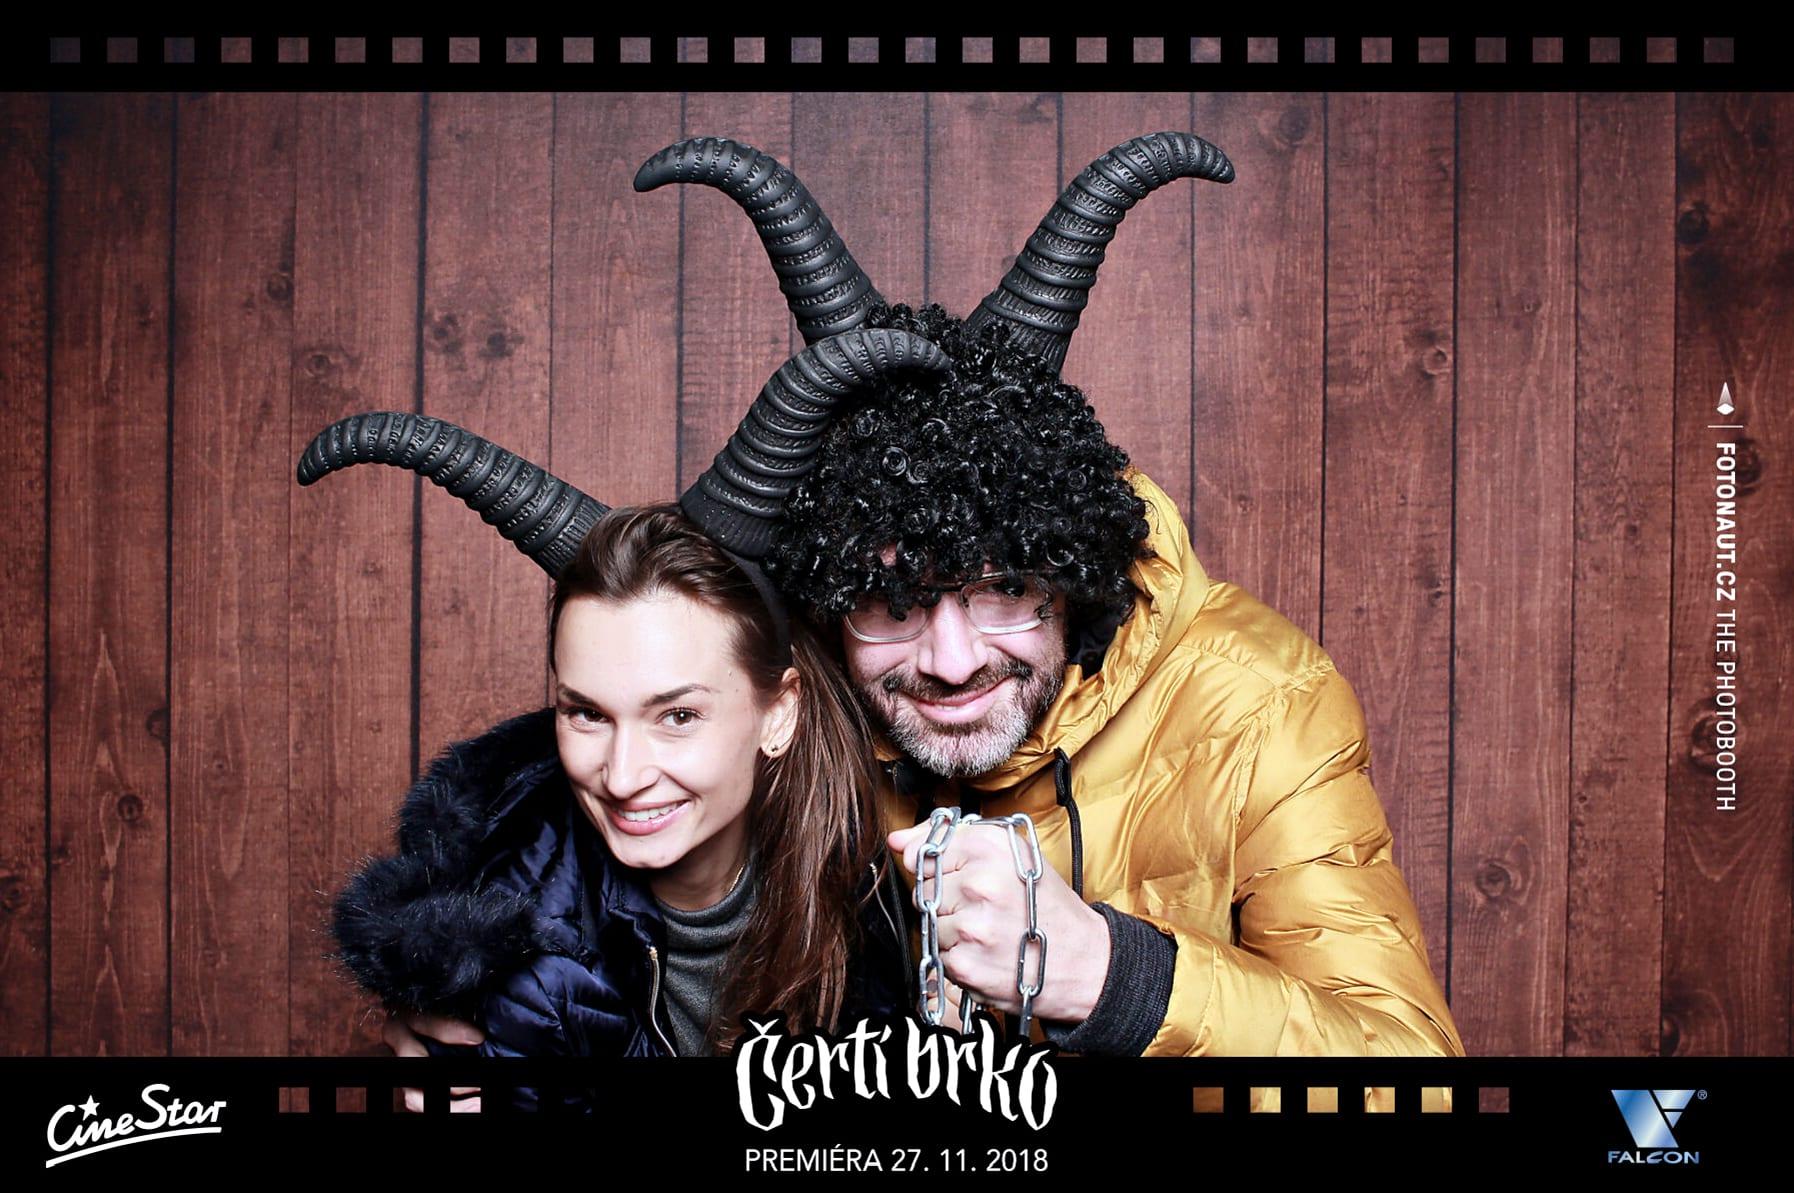 fotokoutek-cinestar-1-27-11-2018-527054